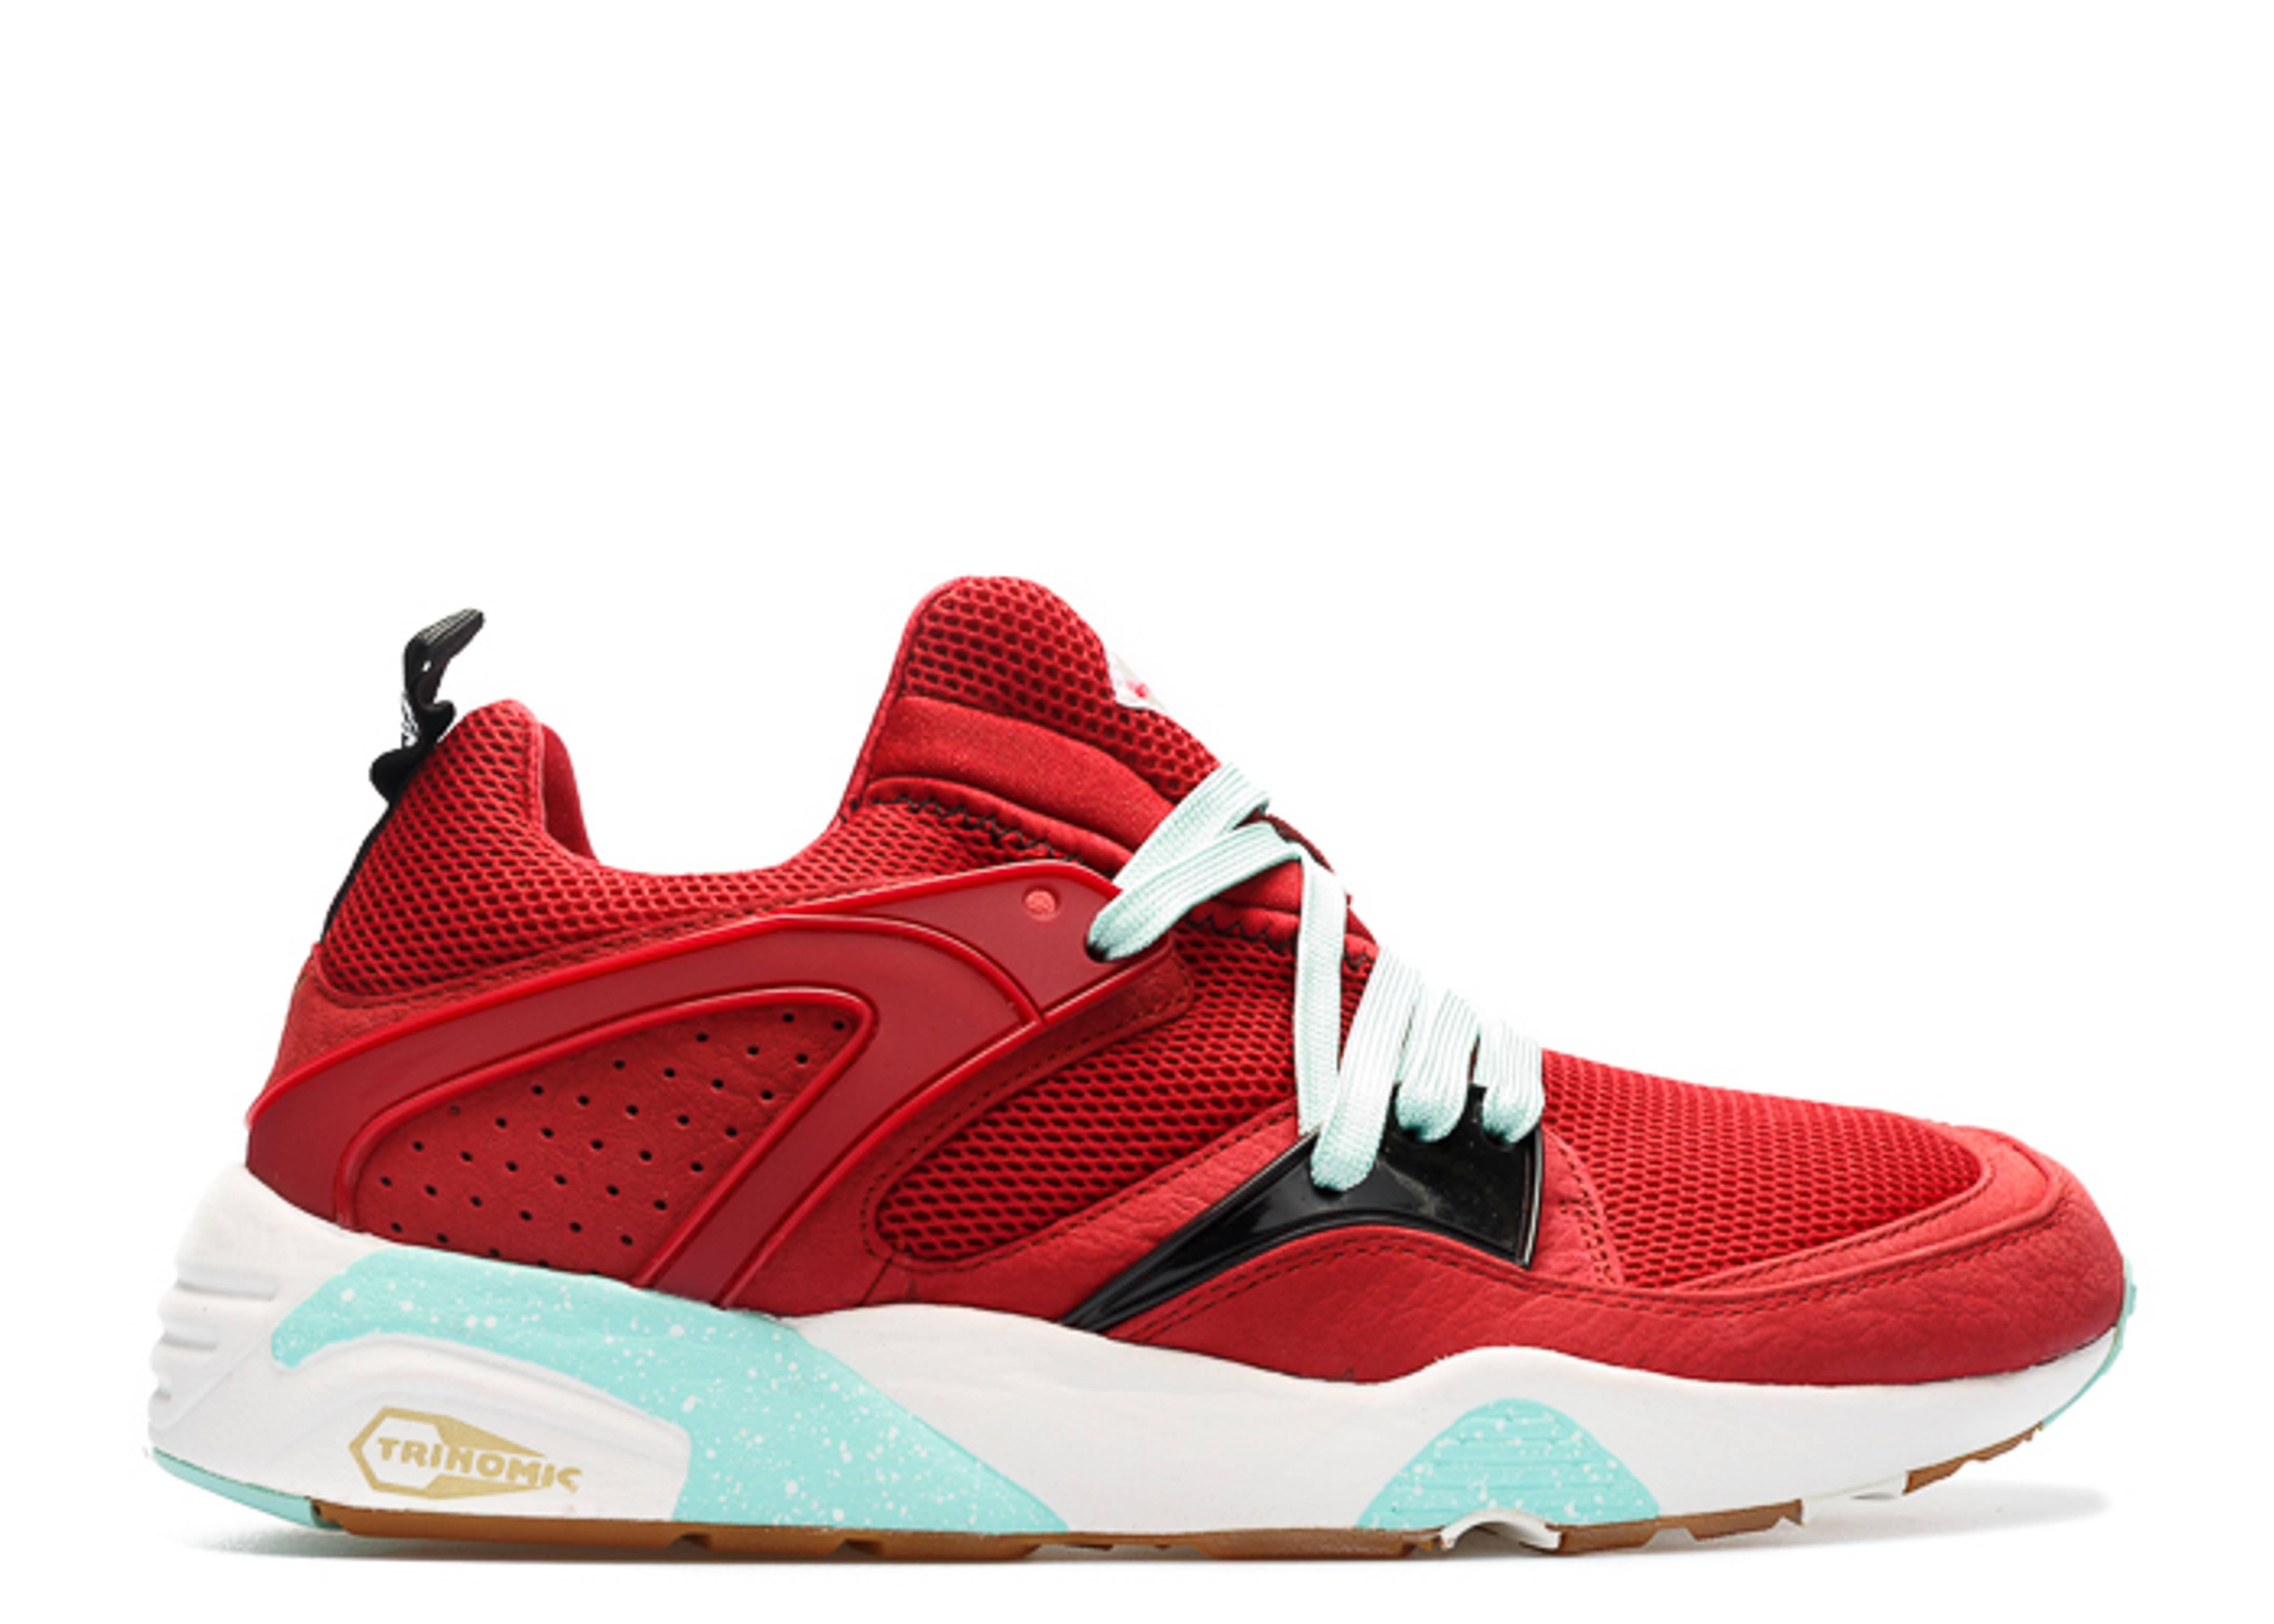 puma trinomic r698 sneakers heren wit paars geel 2 116126 puma trinomic r698  43 puma trinomic bloodbath rio red beach glass . 6d1427e81